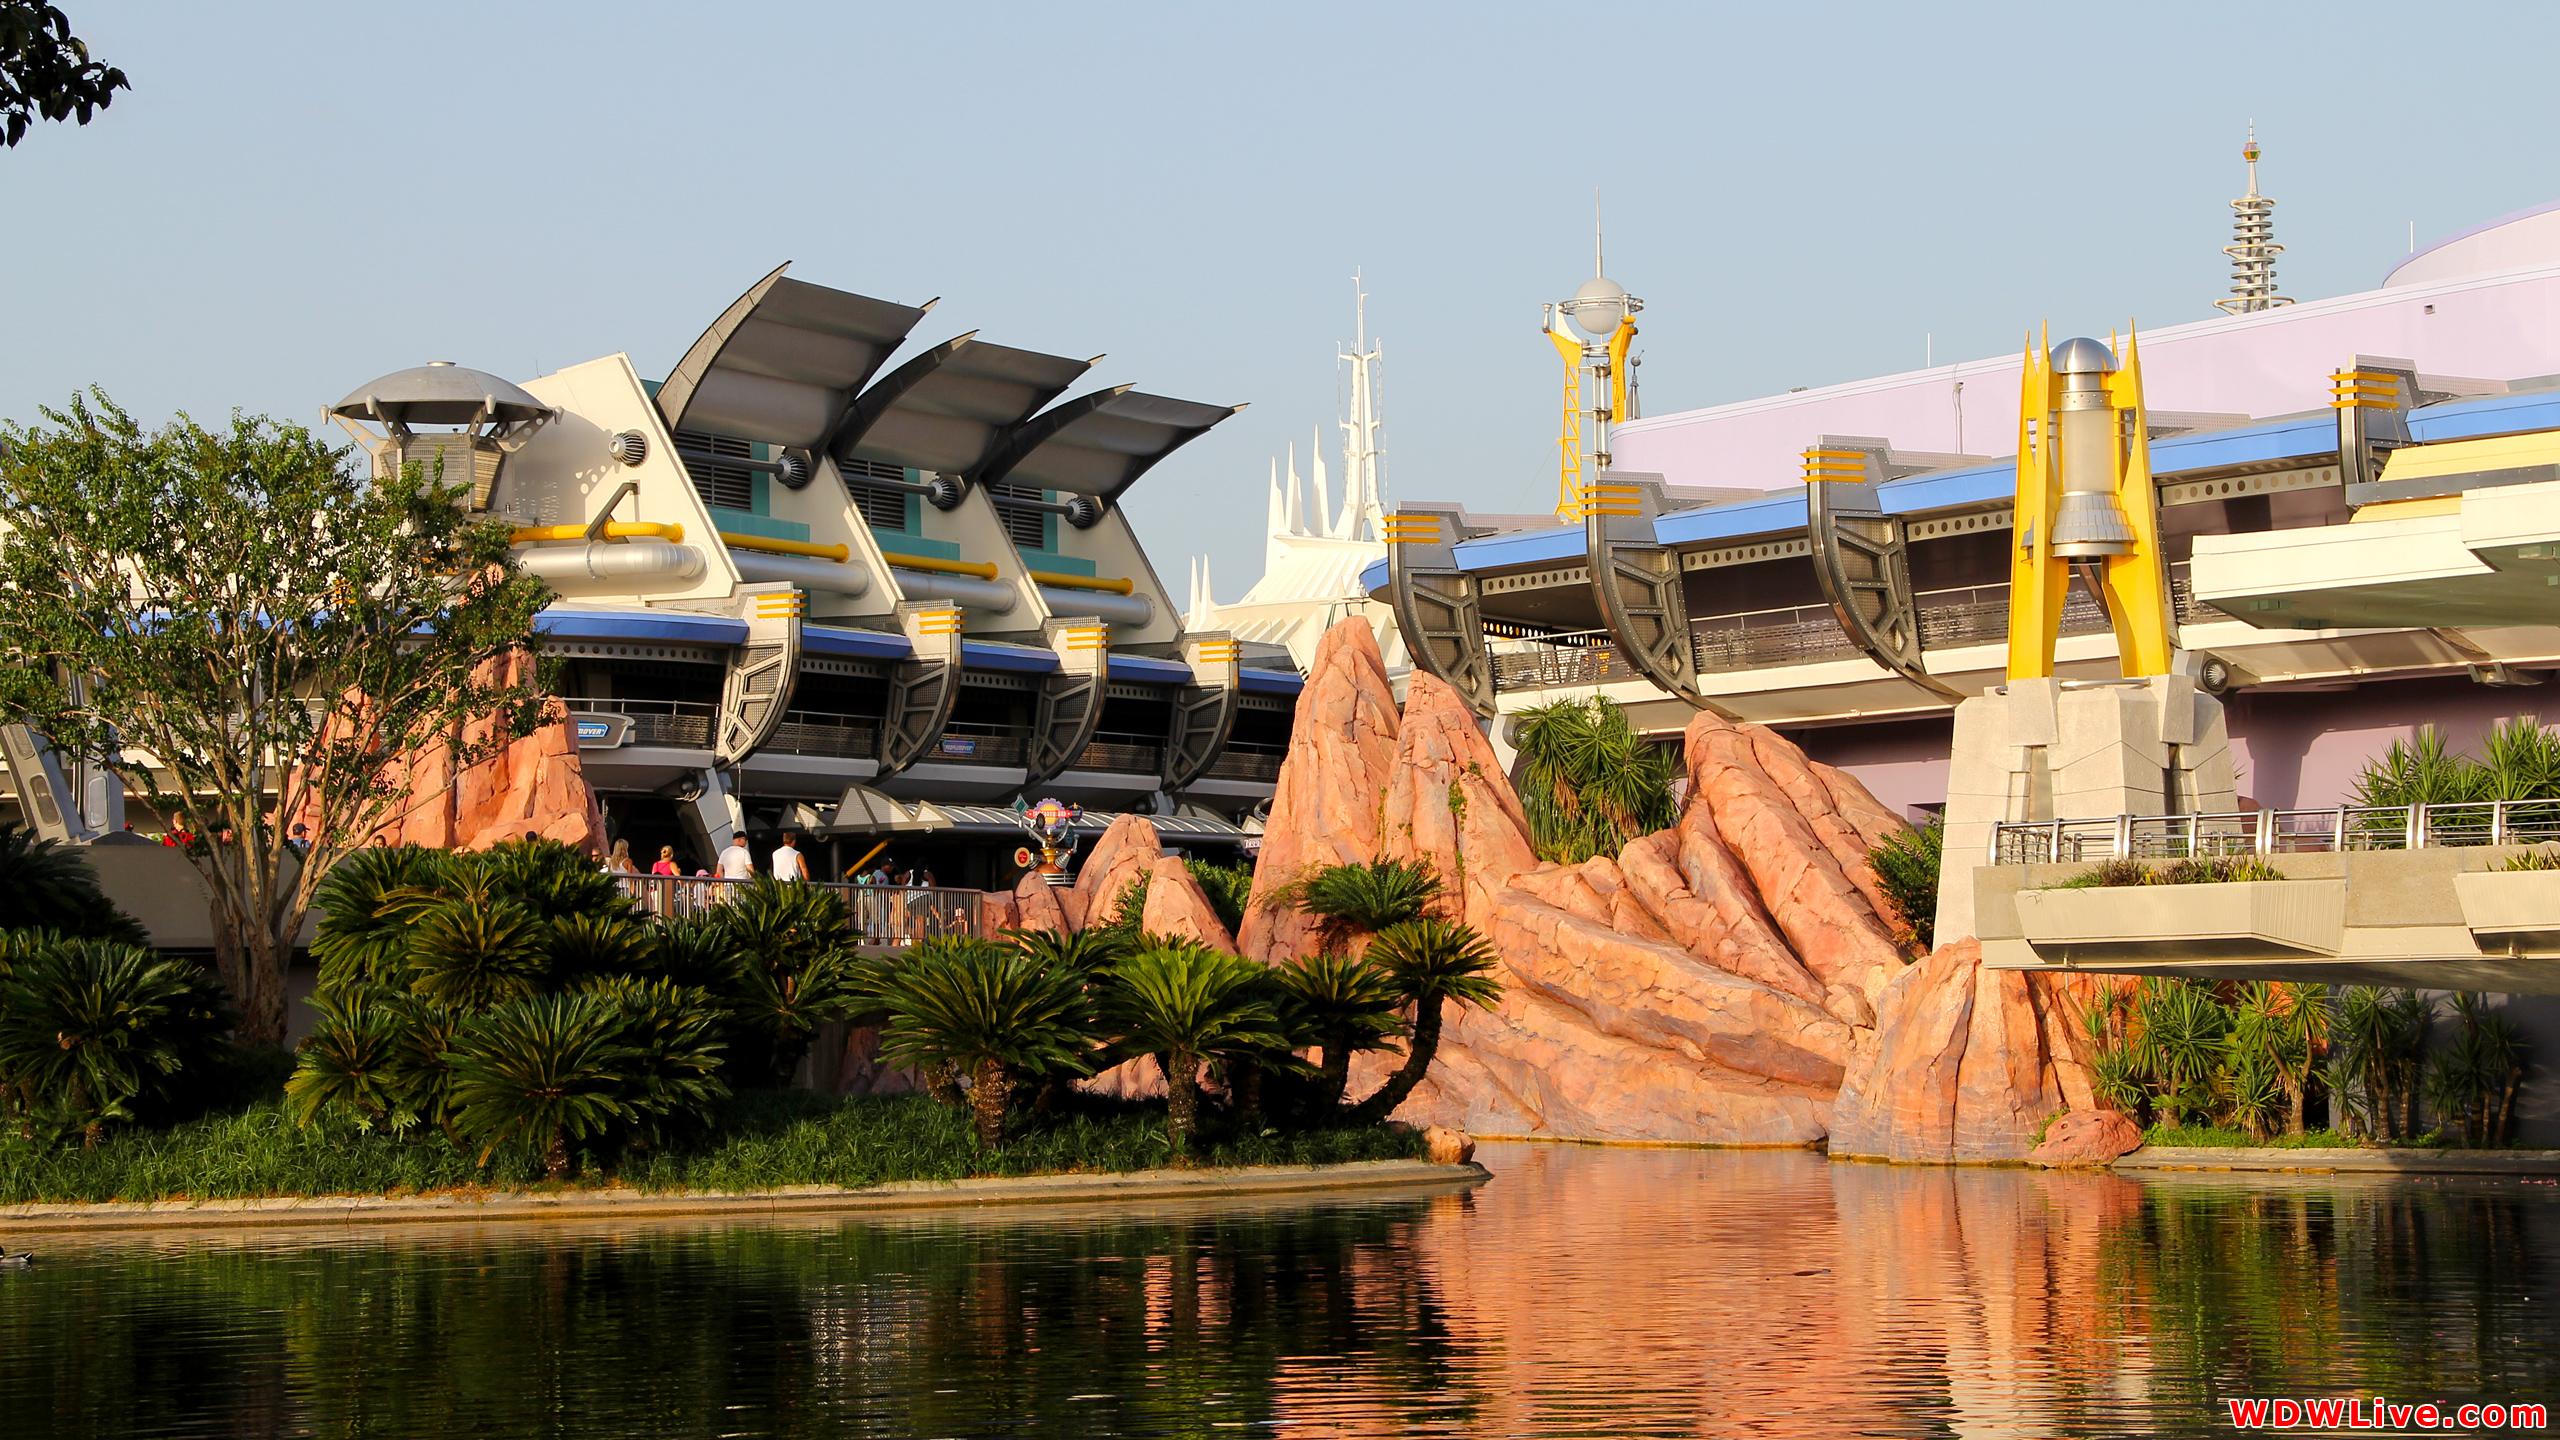 Tomorrowland Its a beautiful day to visit Tomorrowland 2560x1440